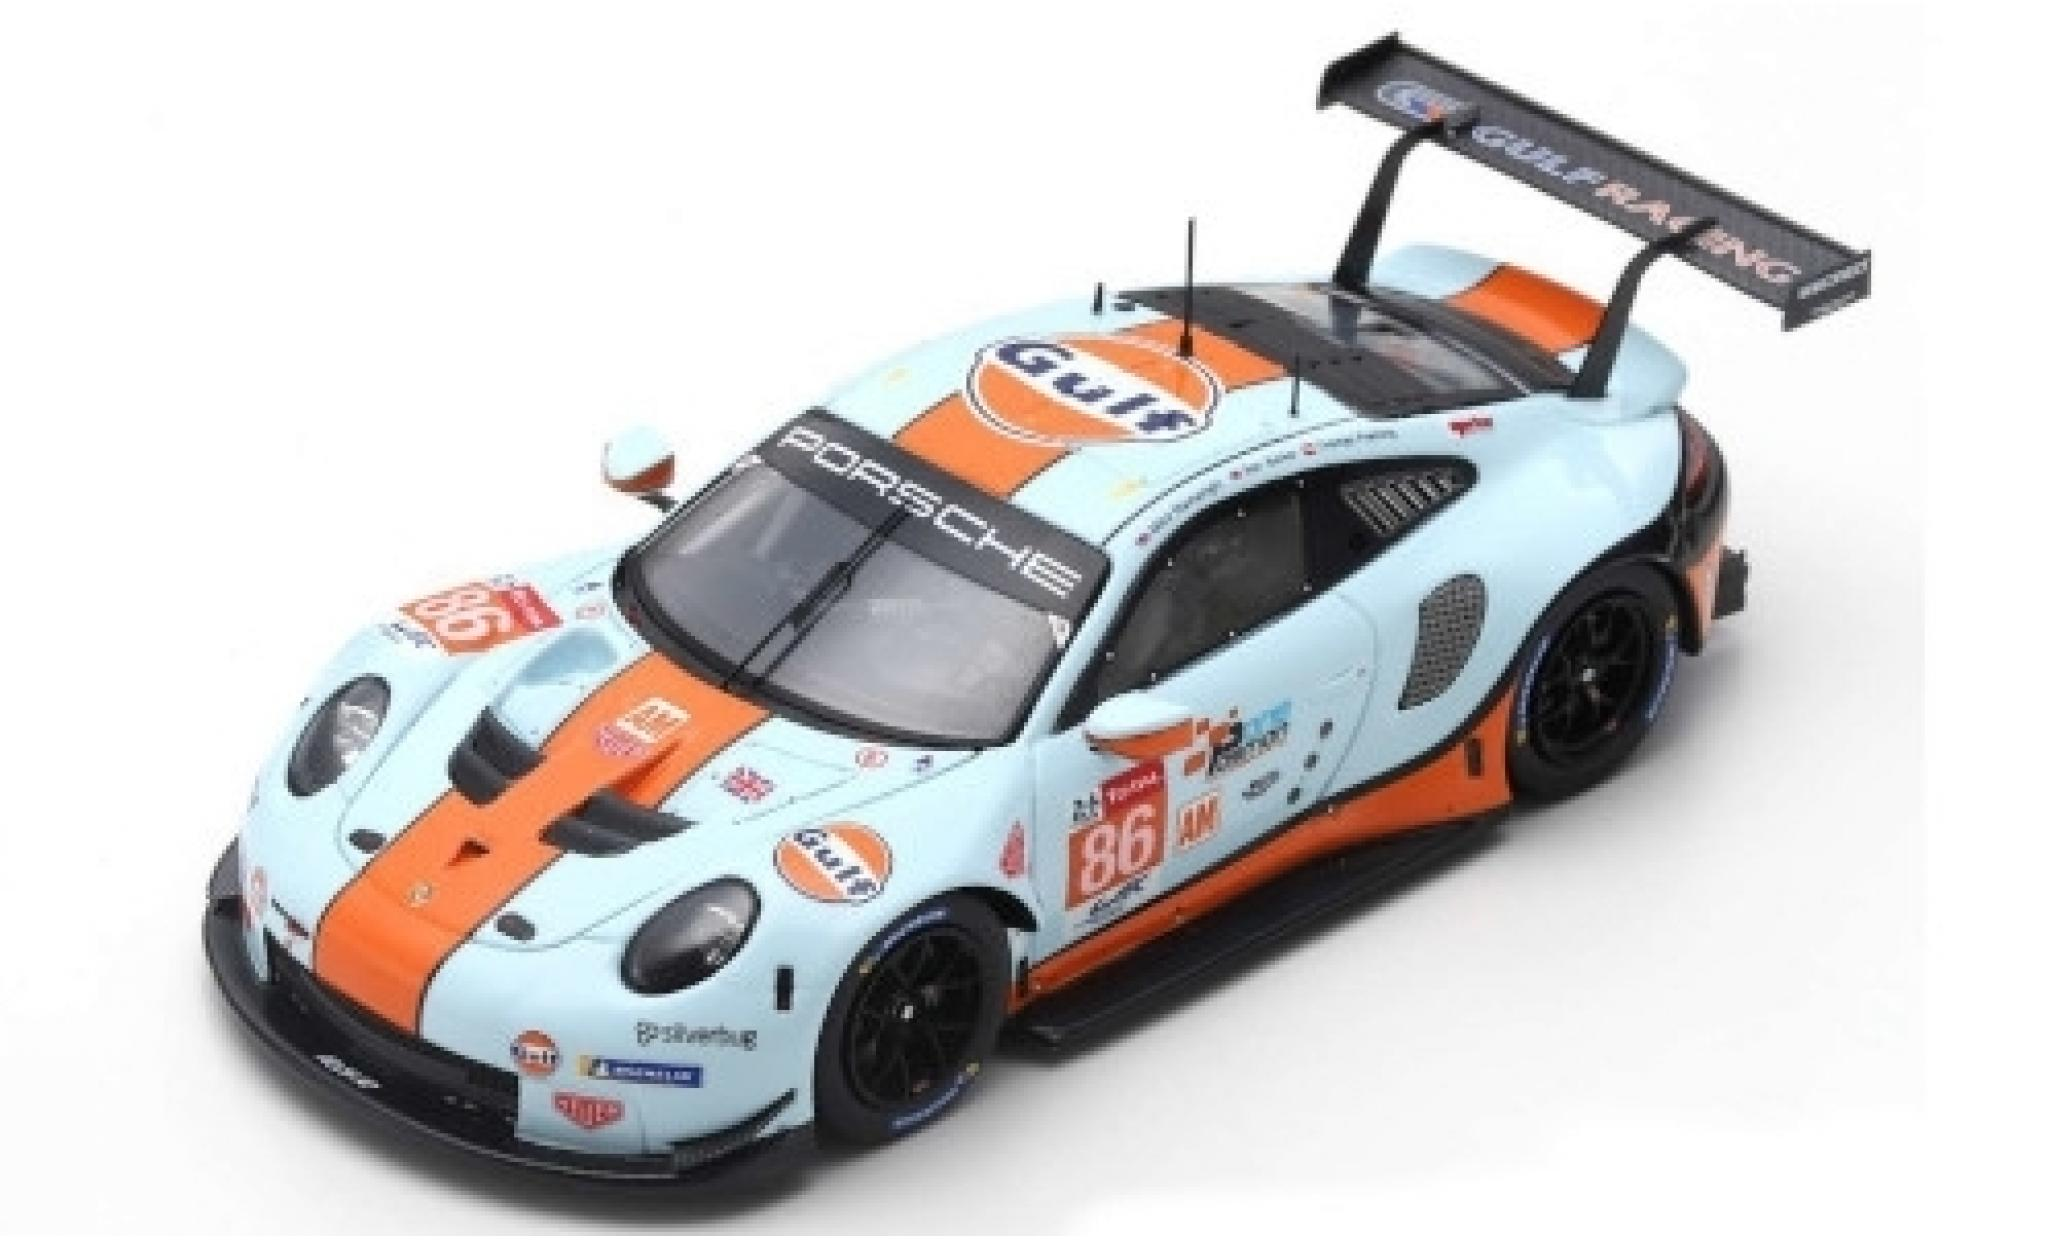 Porsche 992 RSR 1/87 Spark 911 No.86 Gulf Racing Gulf 24h Le Mans 2019 M.Wainwright/B.Barker/T.Preining